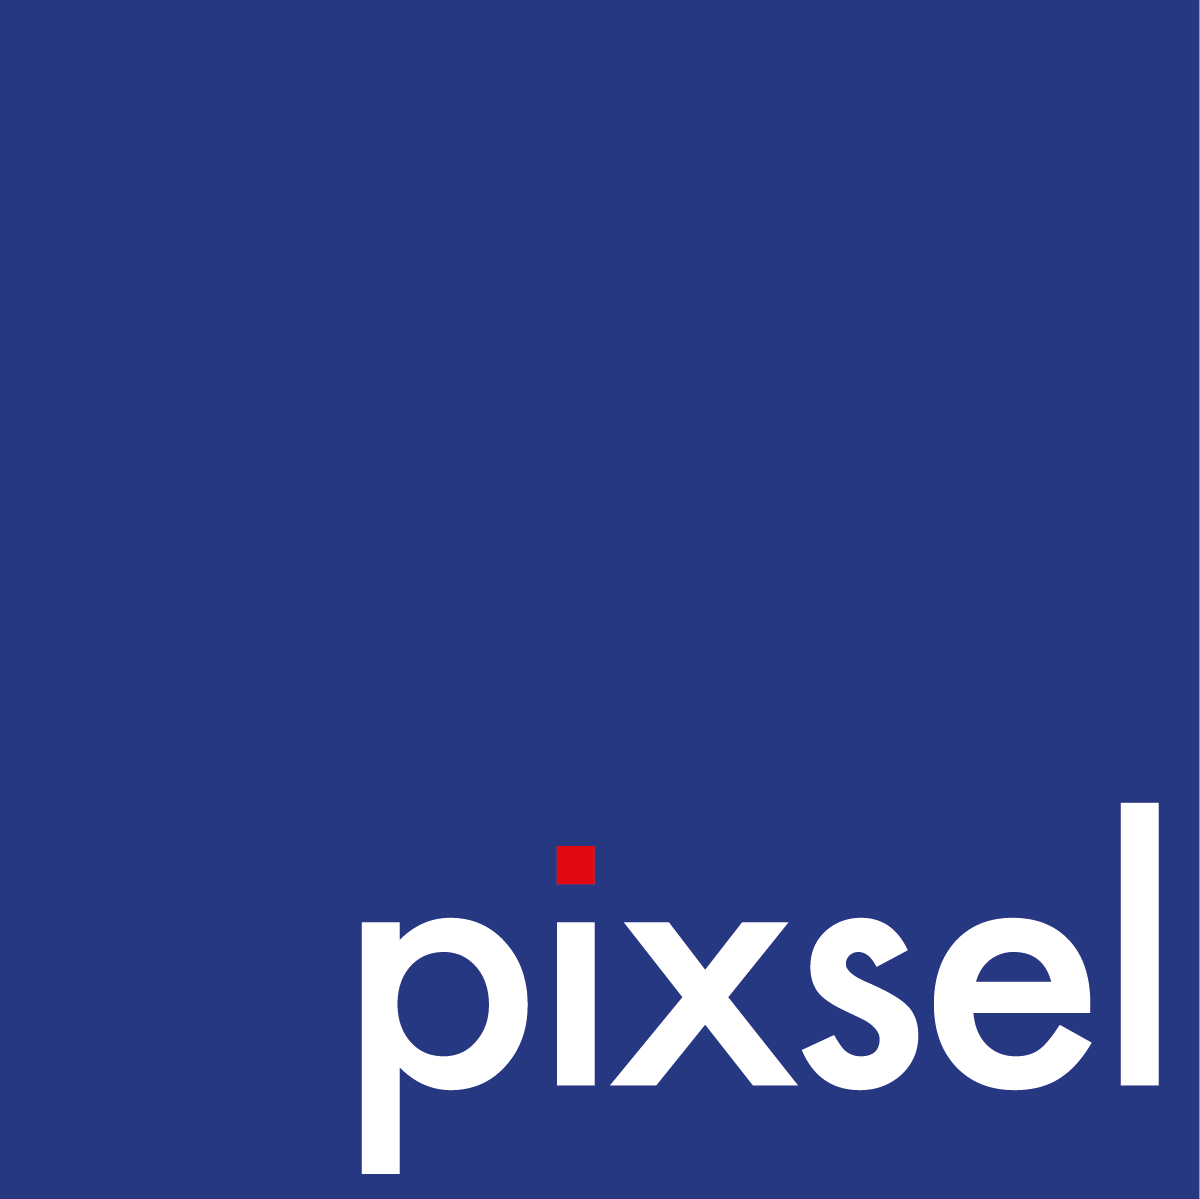 Pixsel Limited